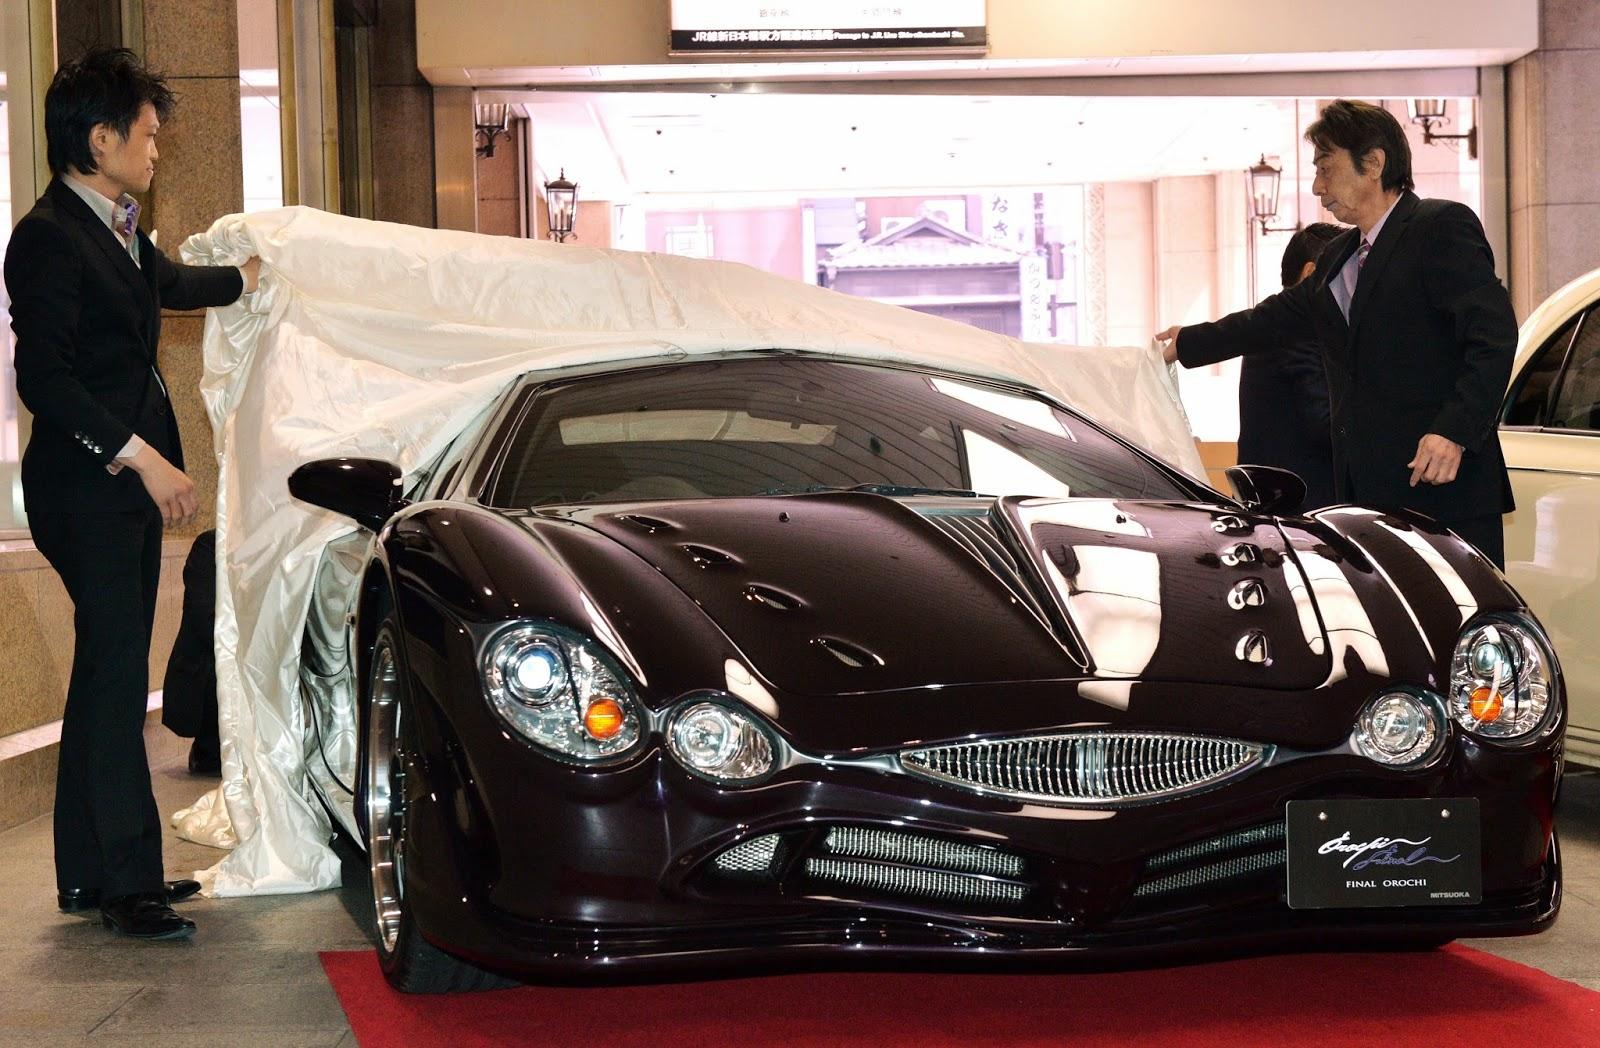 Akio Mitsuoka, Auto Industry, Car Designer, Fashion-Super Car, Japan, Luxury Cars, Mitsuoka Final Orochi, Mitsuoka Motors, Mitsuoka Orochi, Orochi, Sports Cars, Takanori Aoki, Tokyo, Yamata no Orochi,